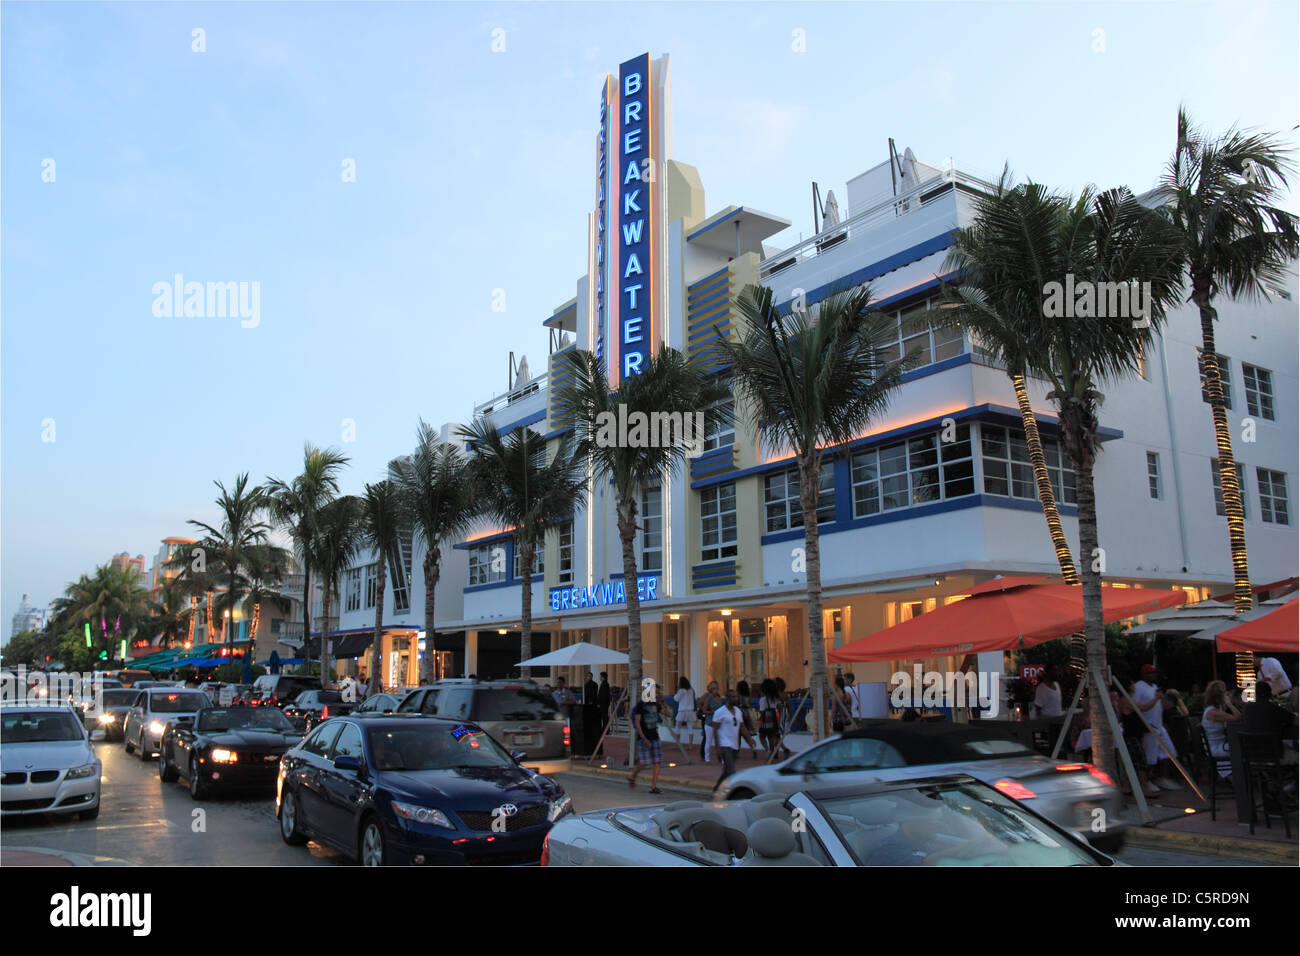 Breakwater Hotel Miami Stock Photos & Breakwater Hotel Miami Stock ...